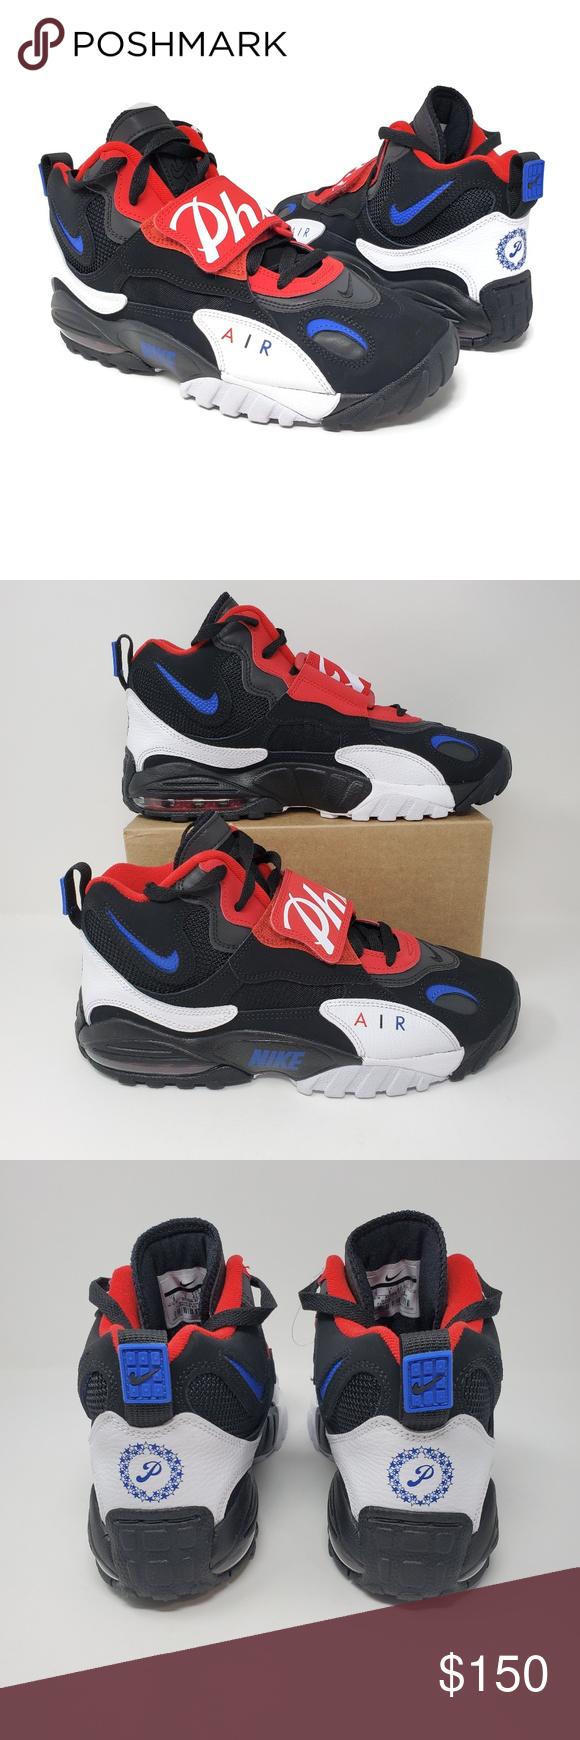 Nike Air Max Speed Turf Men's Football Shoes NIKE Nike Air